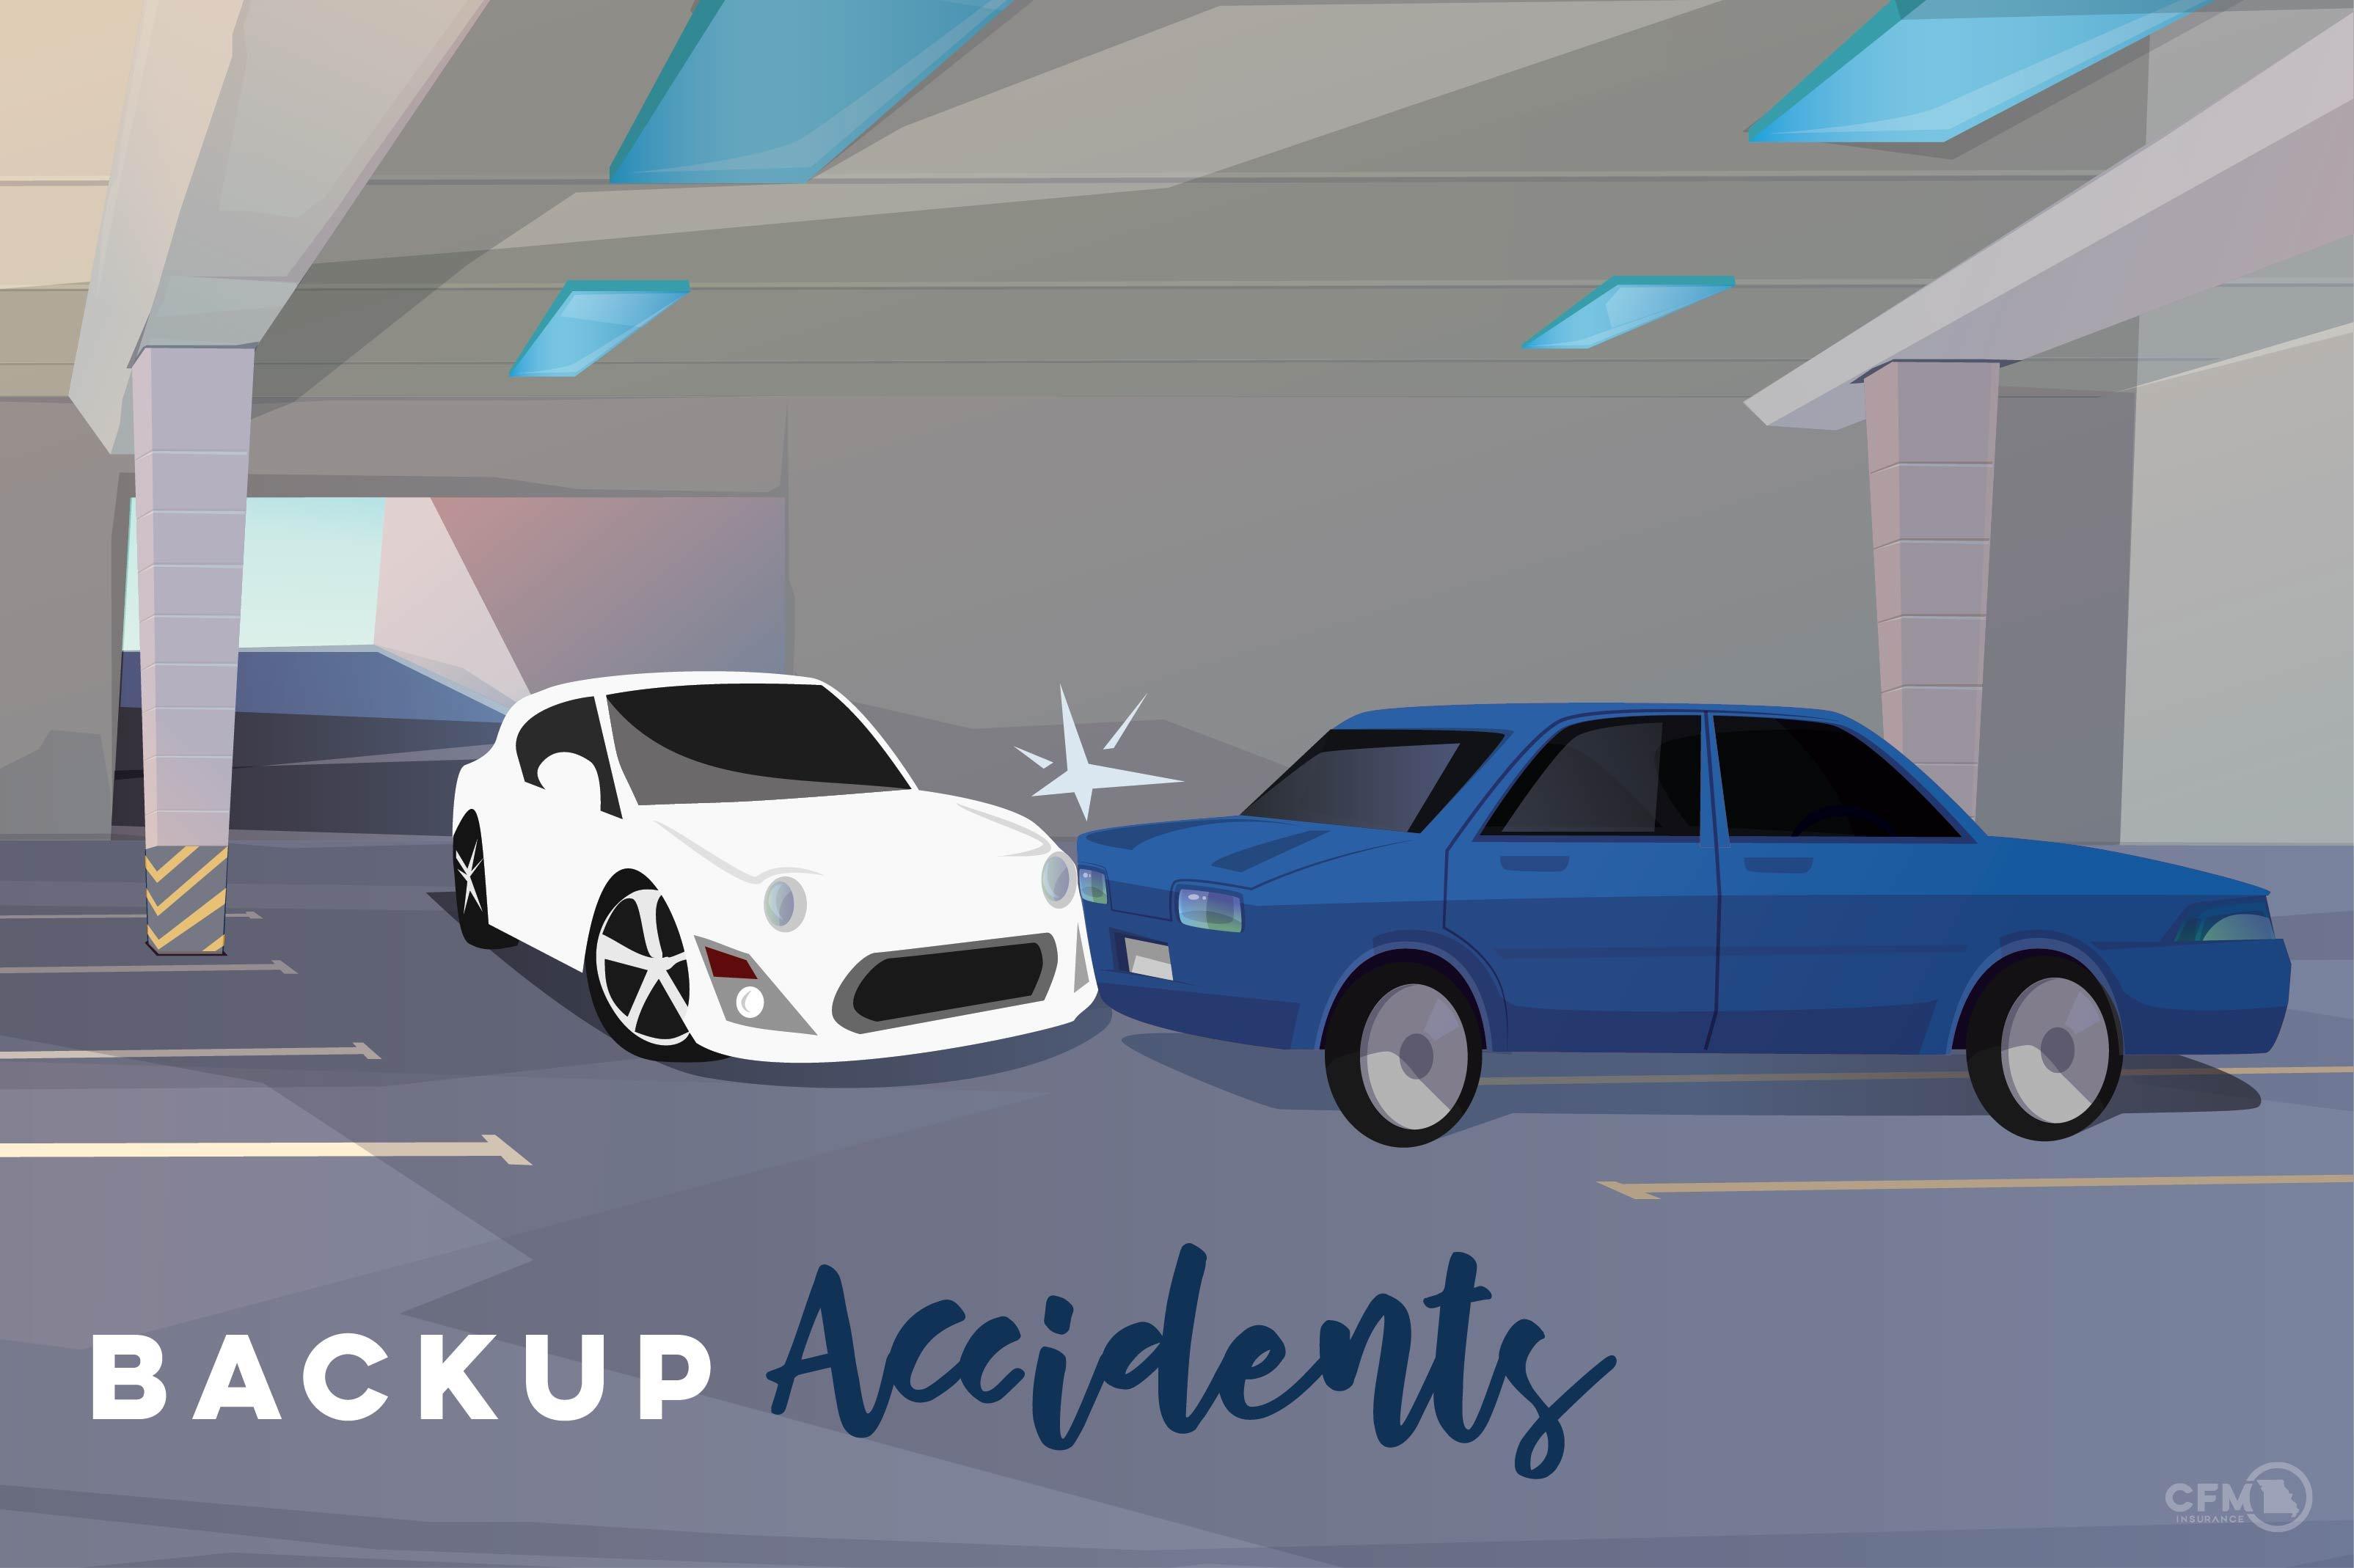 5. 4201B_Backup Accidents_Blog-01